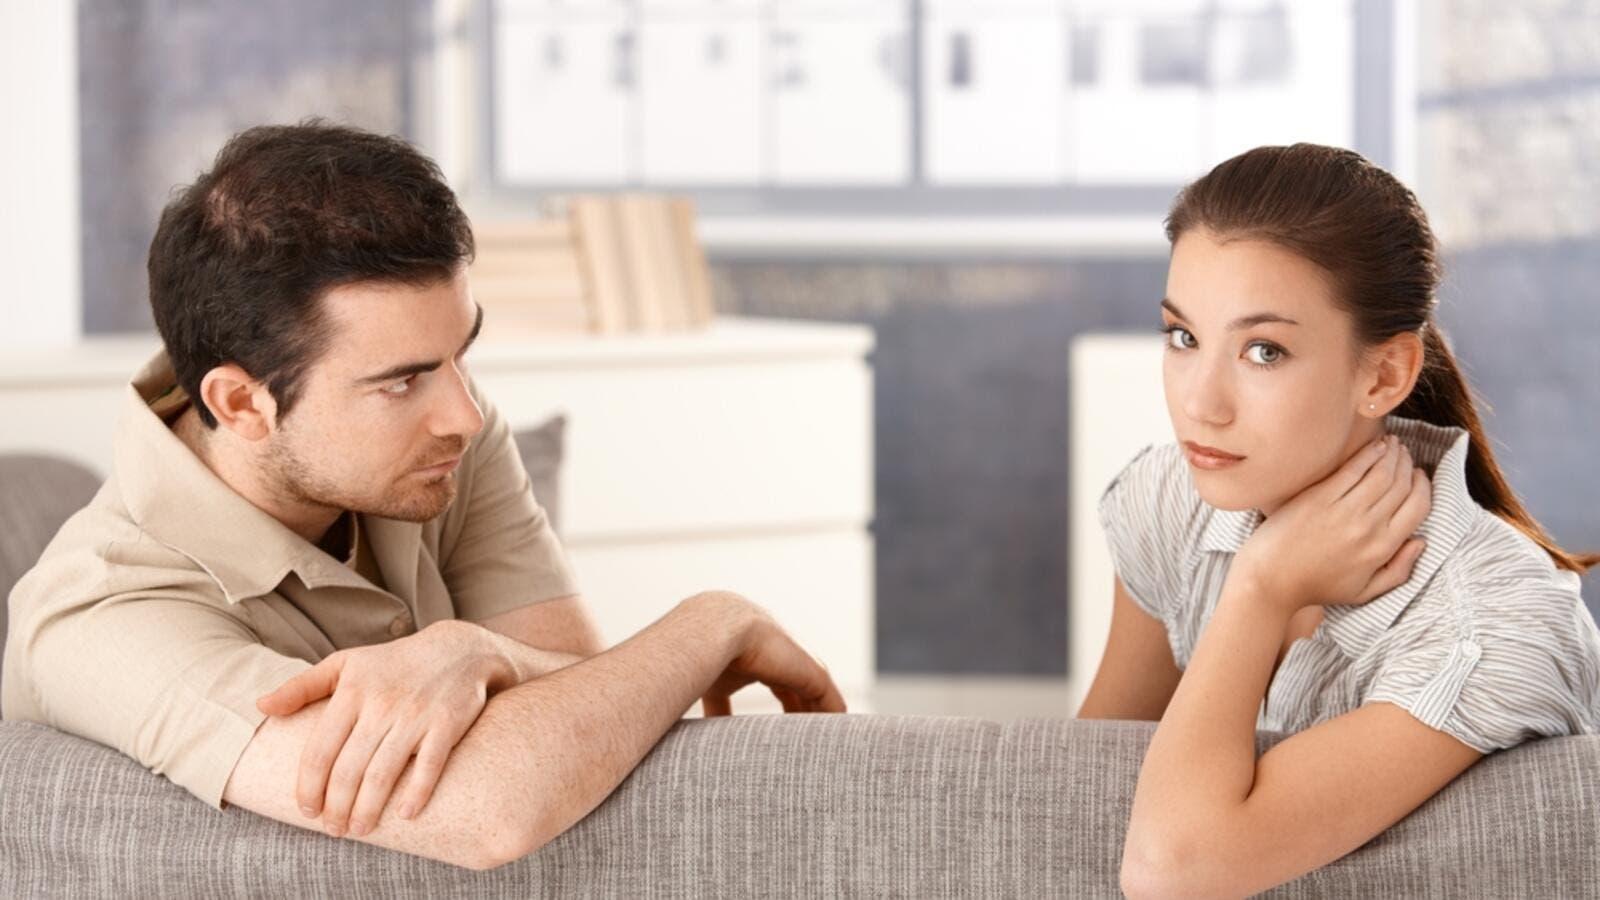 6dfbbd0146859 4 عبارات ينبغي على كل امرأة ألا تقولها لزوجها أبداً